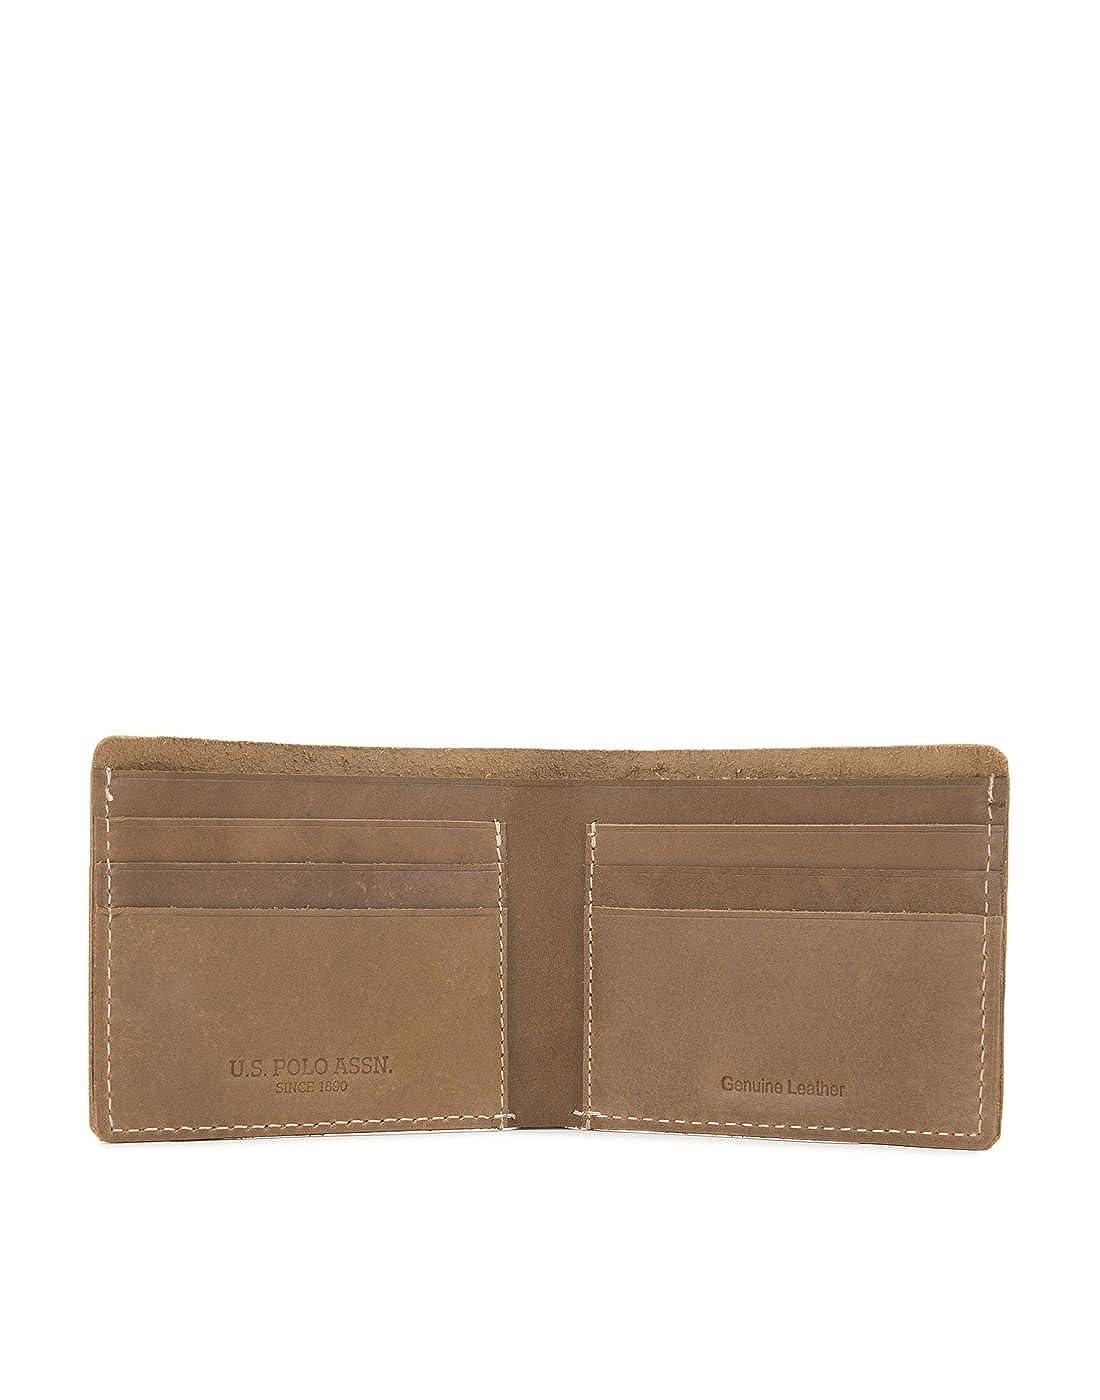 edf4e0a918 US Polo Association Men s Leather Wallet (Brown